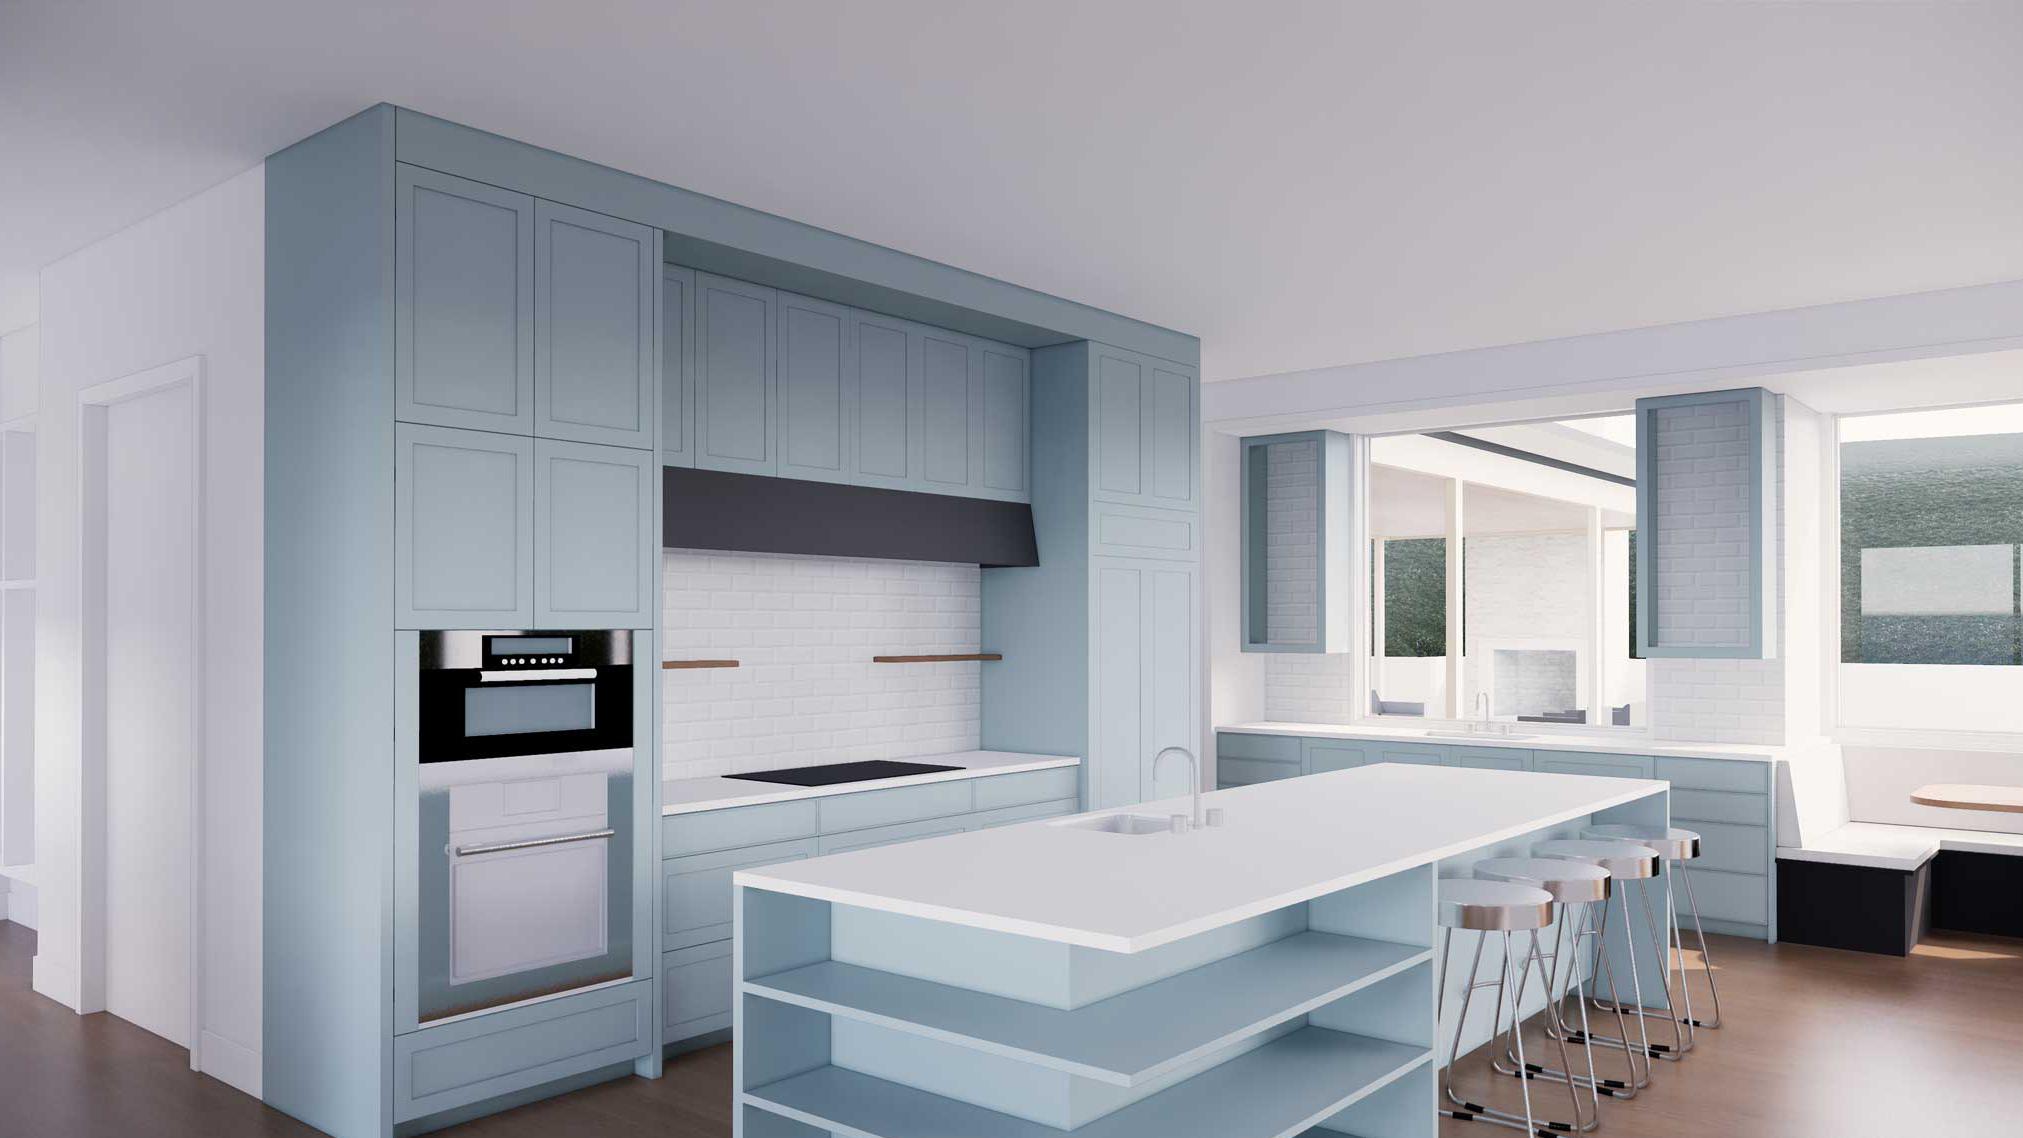 Park-Ave-Enscape-3D rendering services of kitchen layout